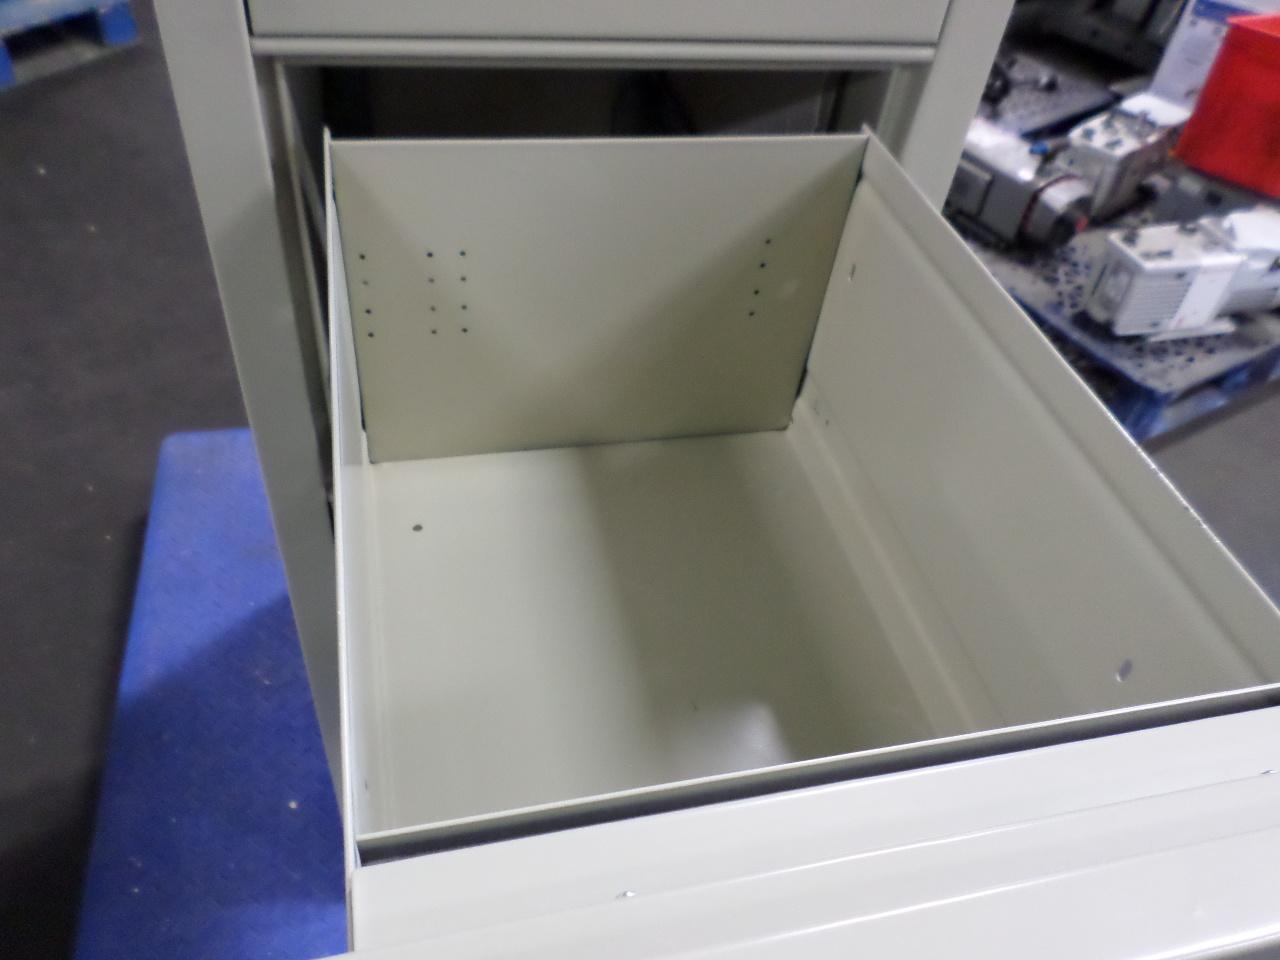 4 Drawer Letter Size File Cabinet Fireking Turtle 4 Drawer Fireproof File Cabinet Letter Size W